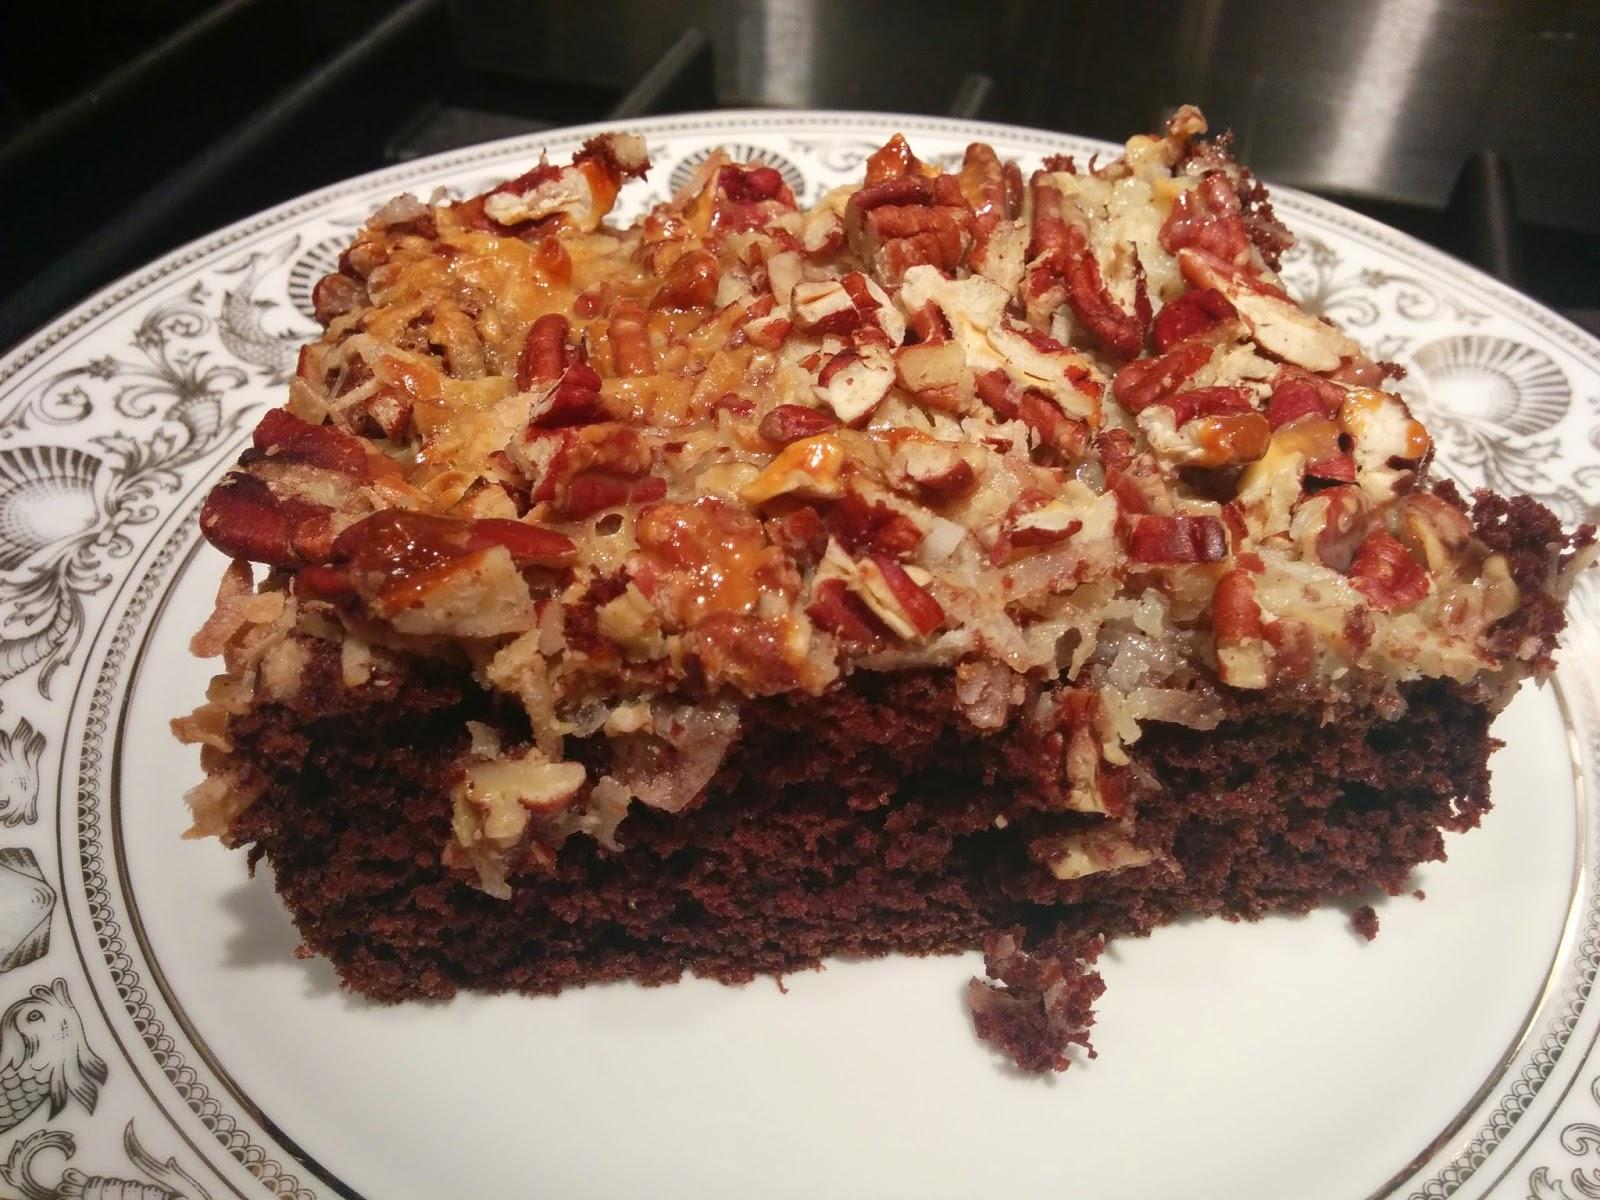 Got it, Cook it: German Chocolate Dump Cake